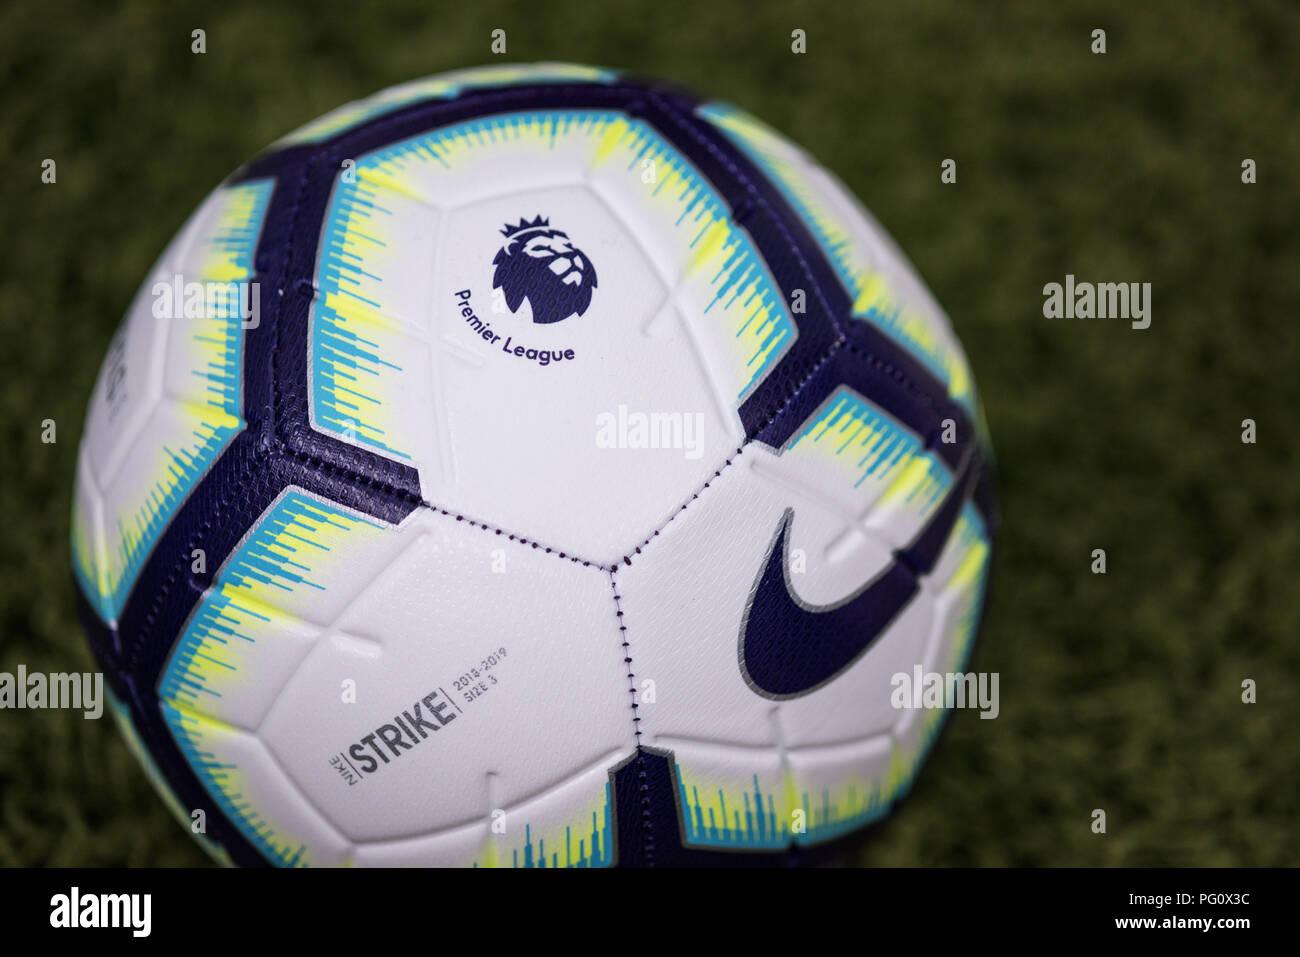 937aad5e12f42 Merlin Nike pelota para la temporada 2018 19 de la Premier League. Imagen De